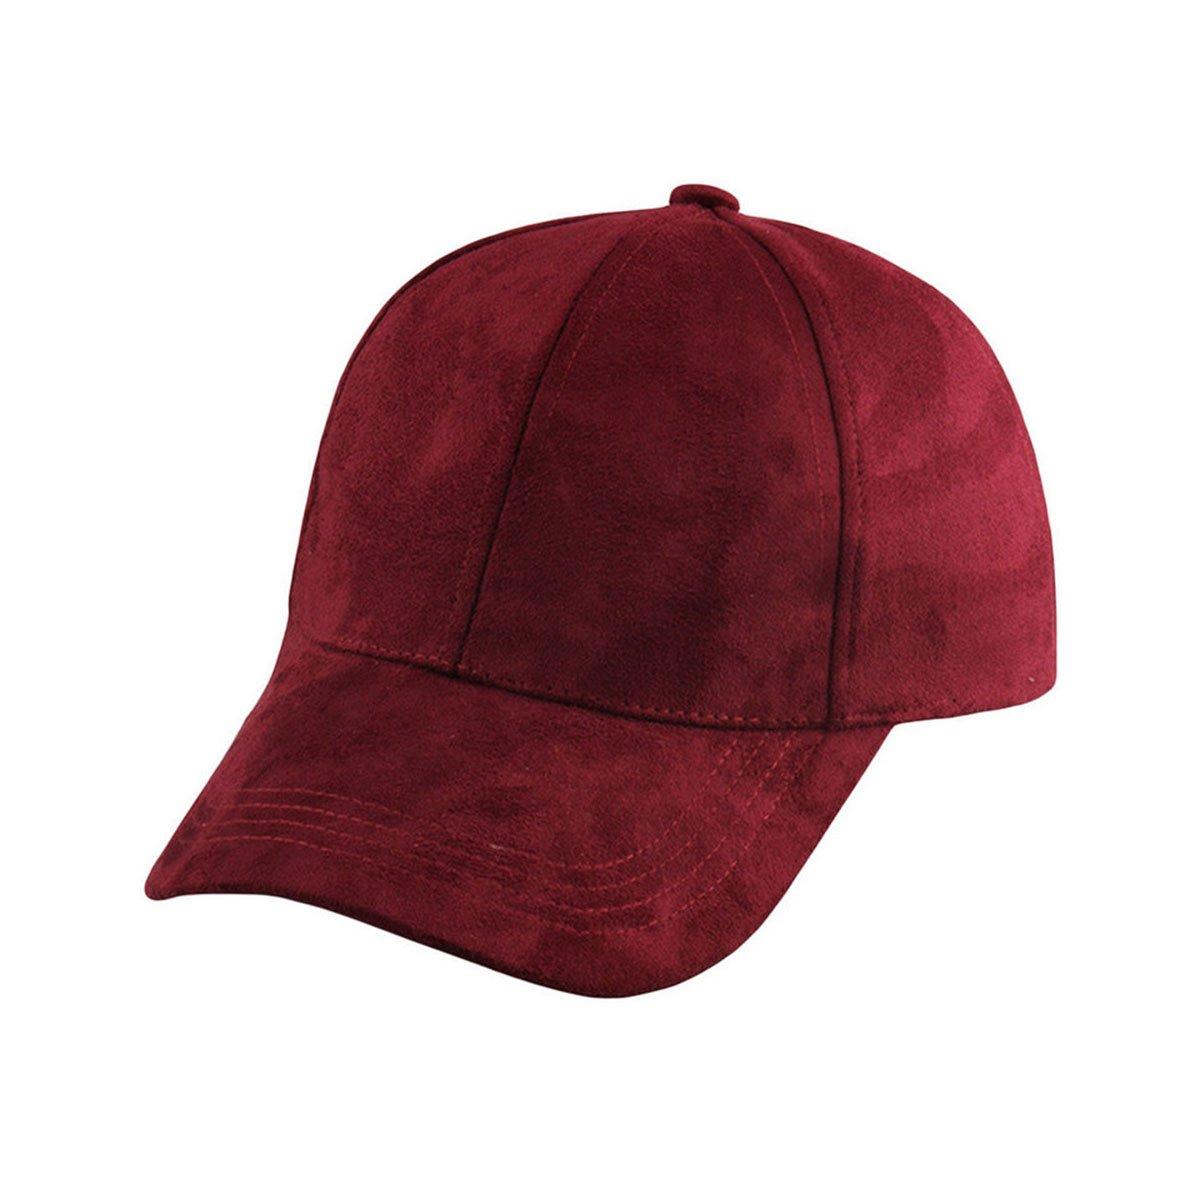 5a4a3db2ff01c1 Generic Fashion Men Women Suede Baseball Cap Snapback Visor Sport Sun Adjustable  Hat (Army Green) at Amazon Men's Clothing store: